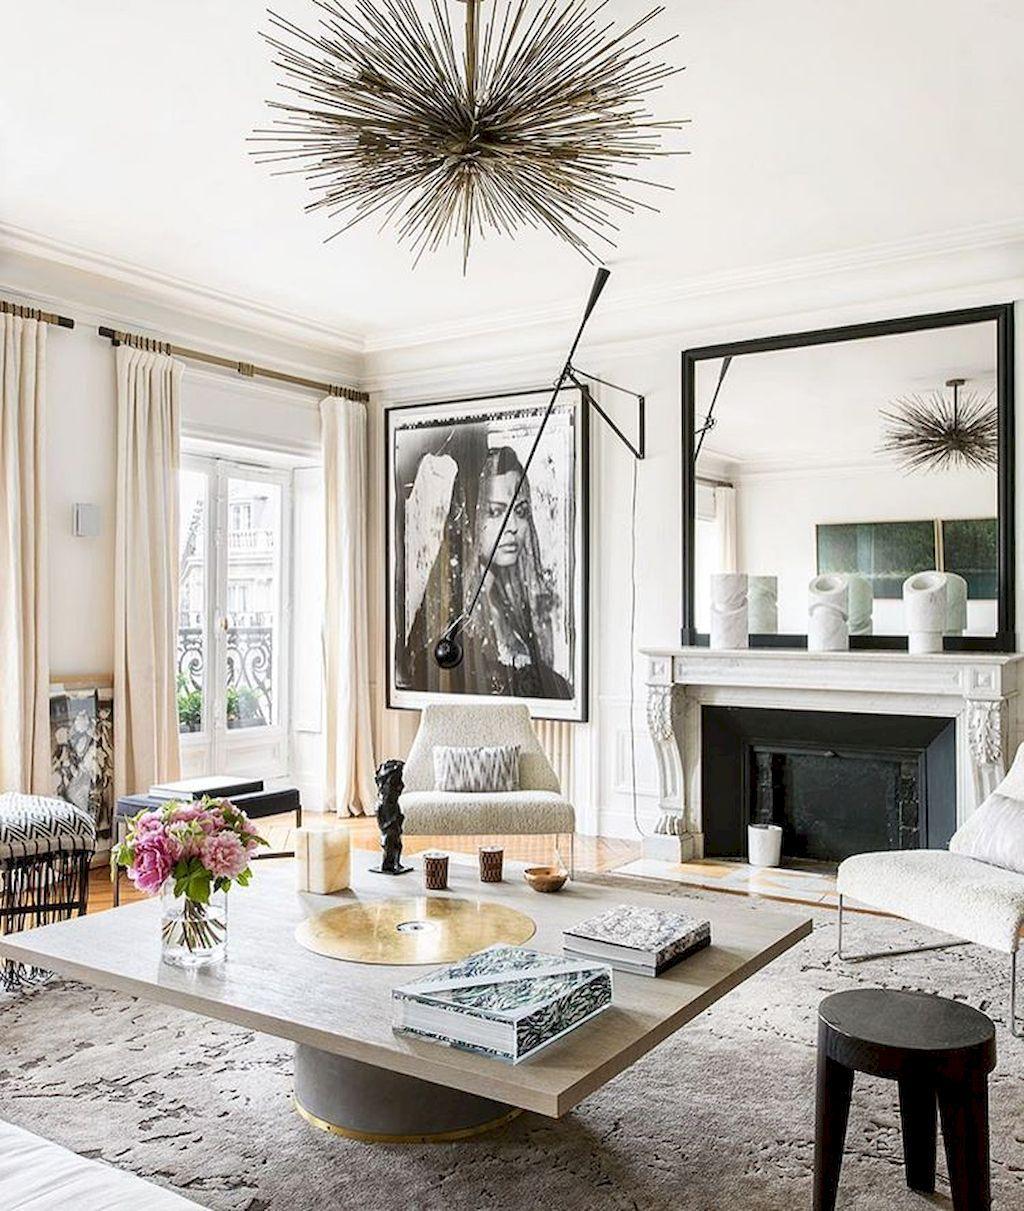 44 Modern Bohemian Living Room Ideas for Small Apartment | Pinterest ...